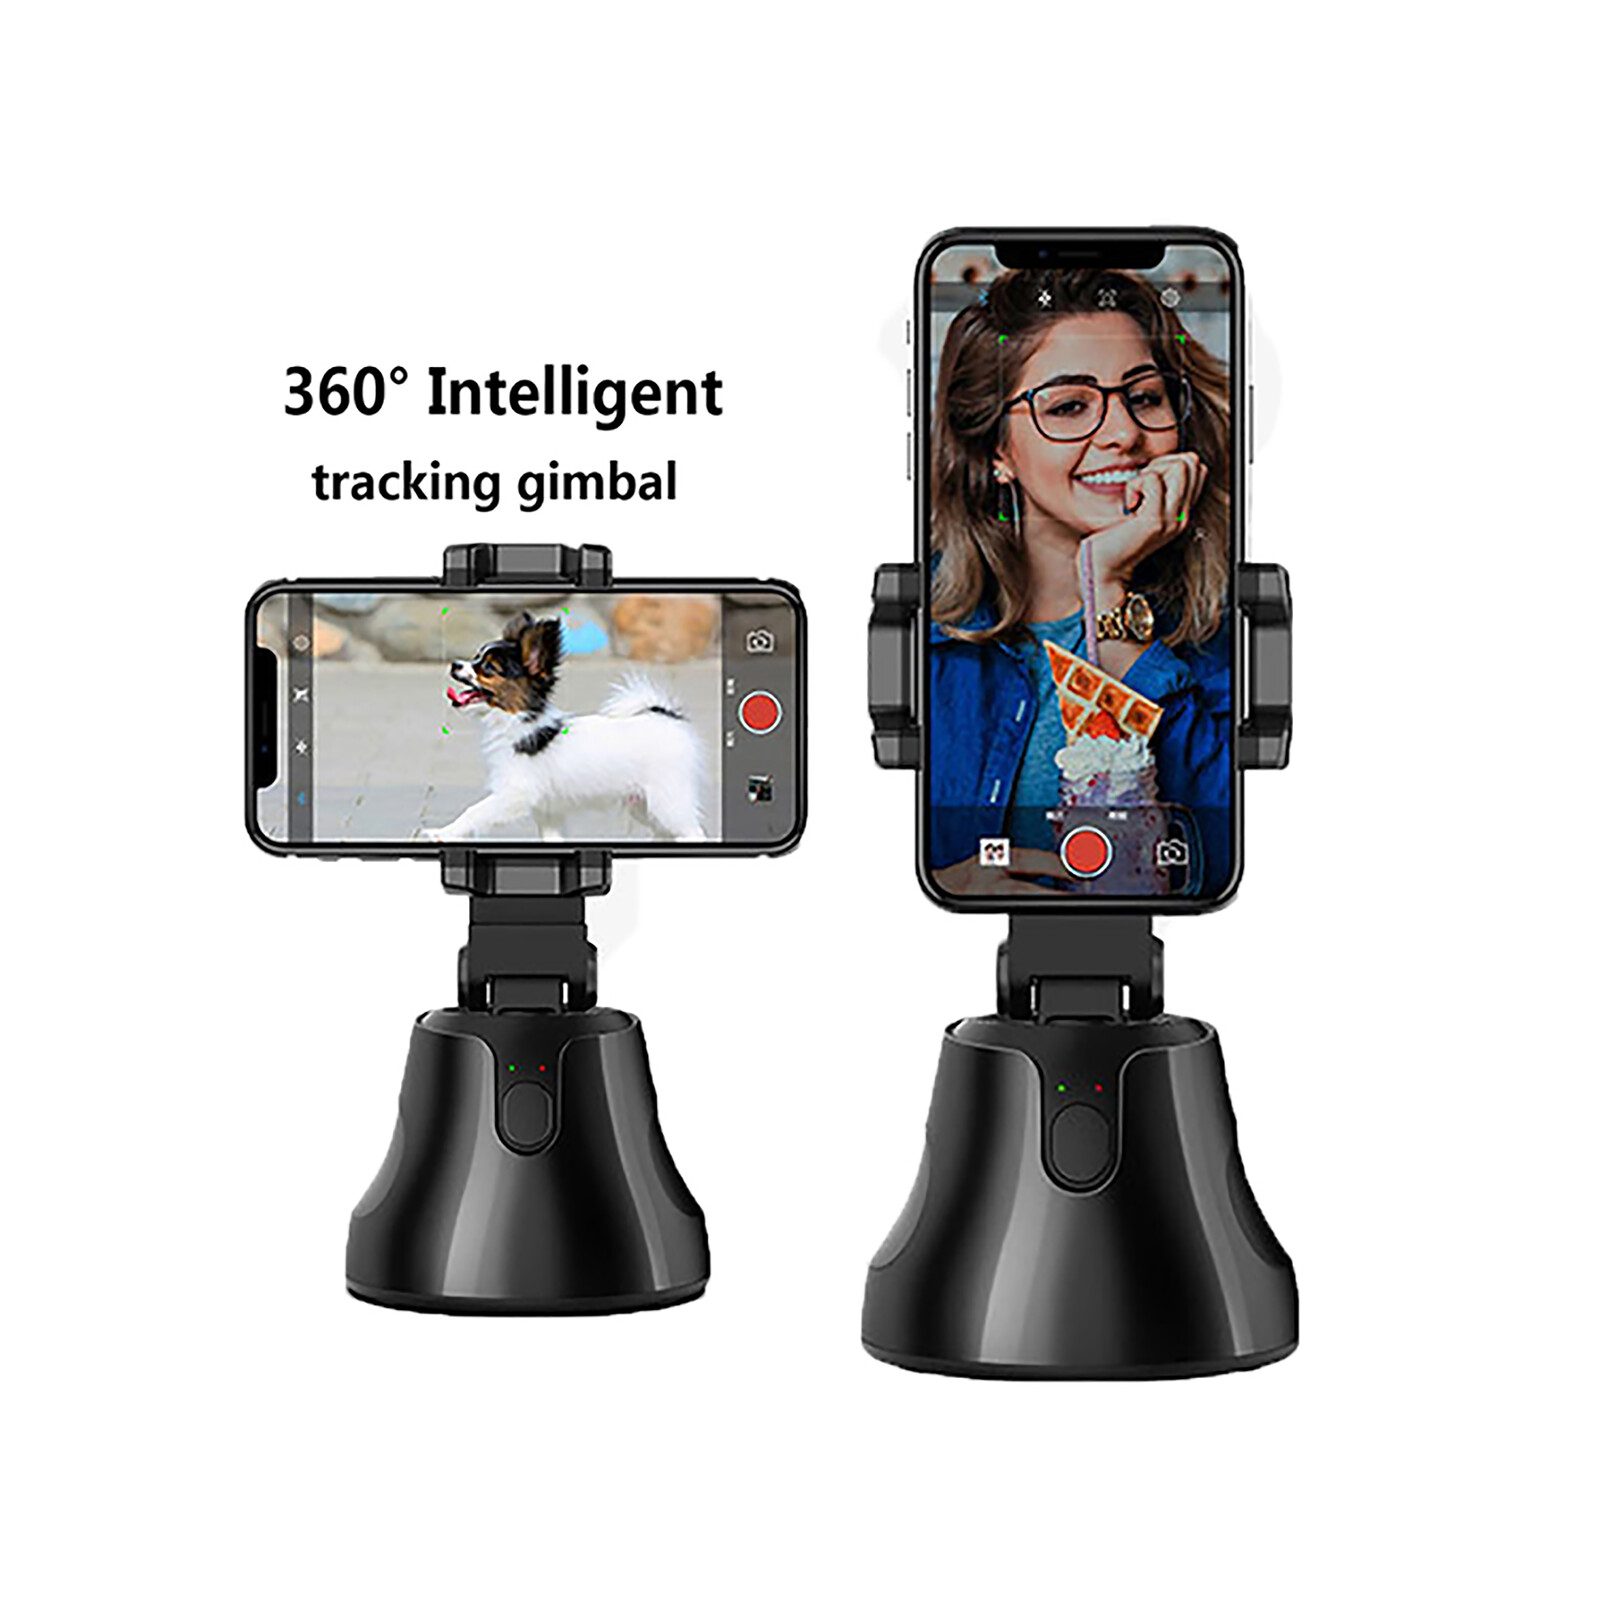 Felixx Influencer 360° Tracking Gimbal